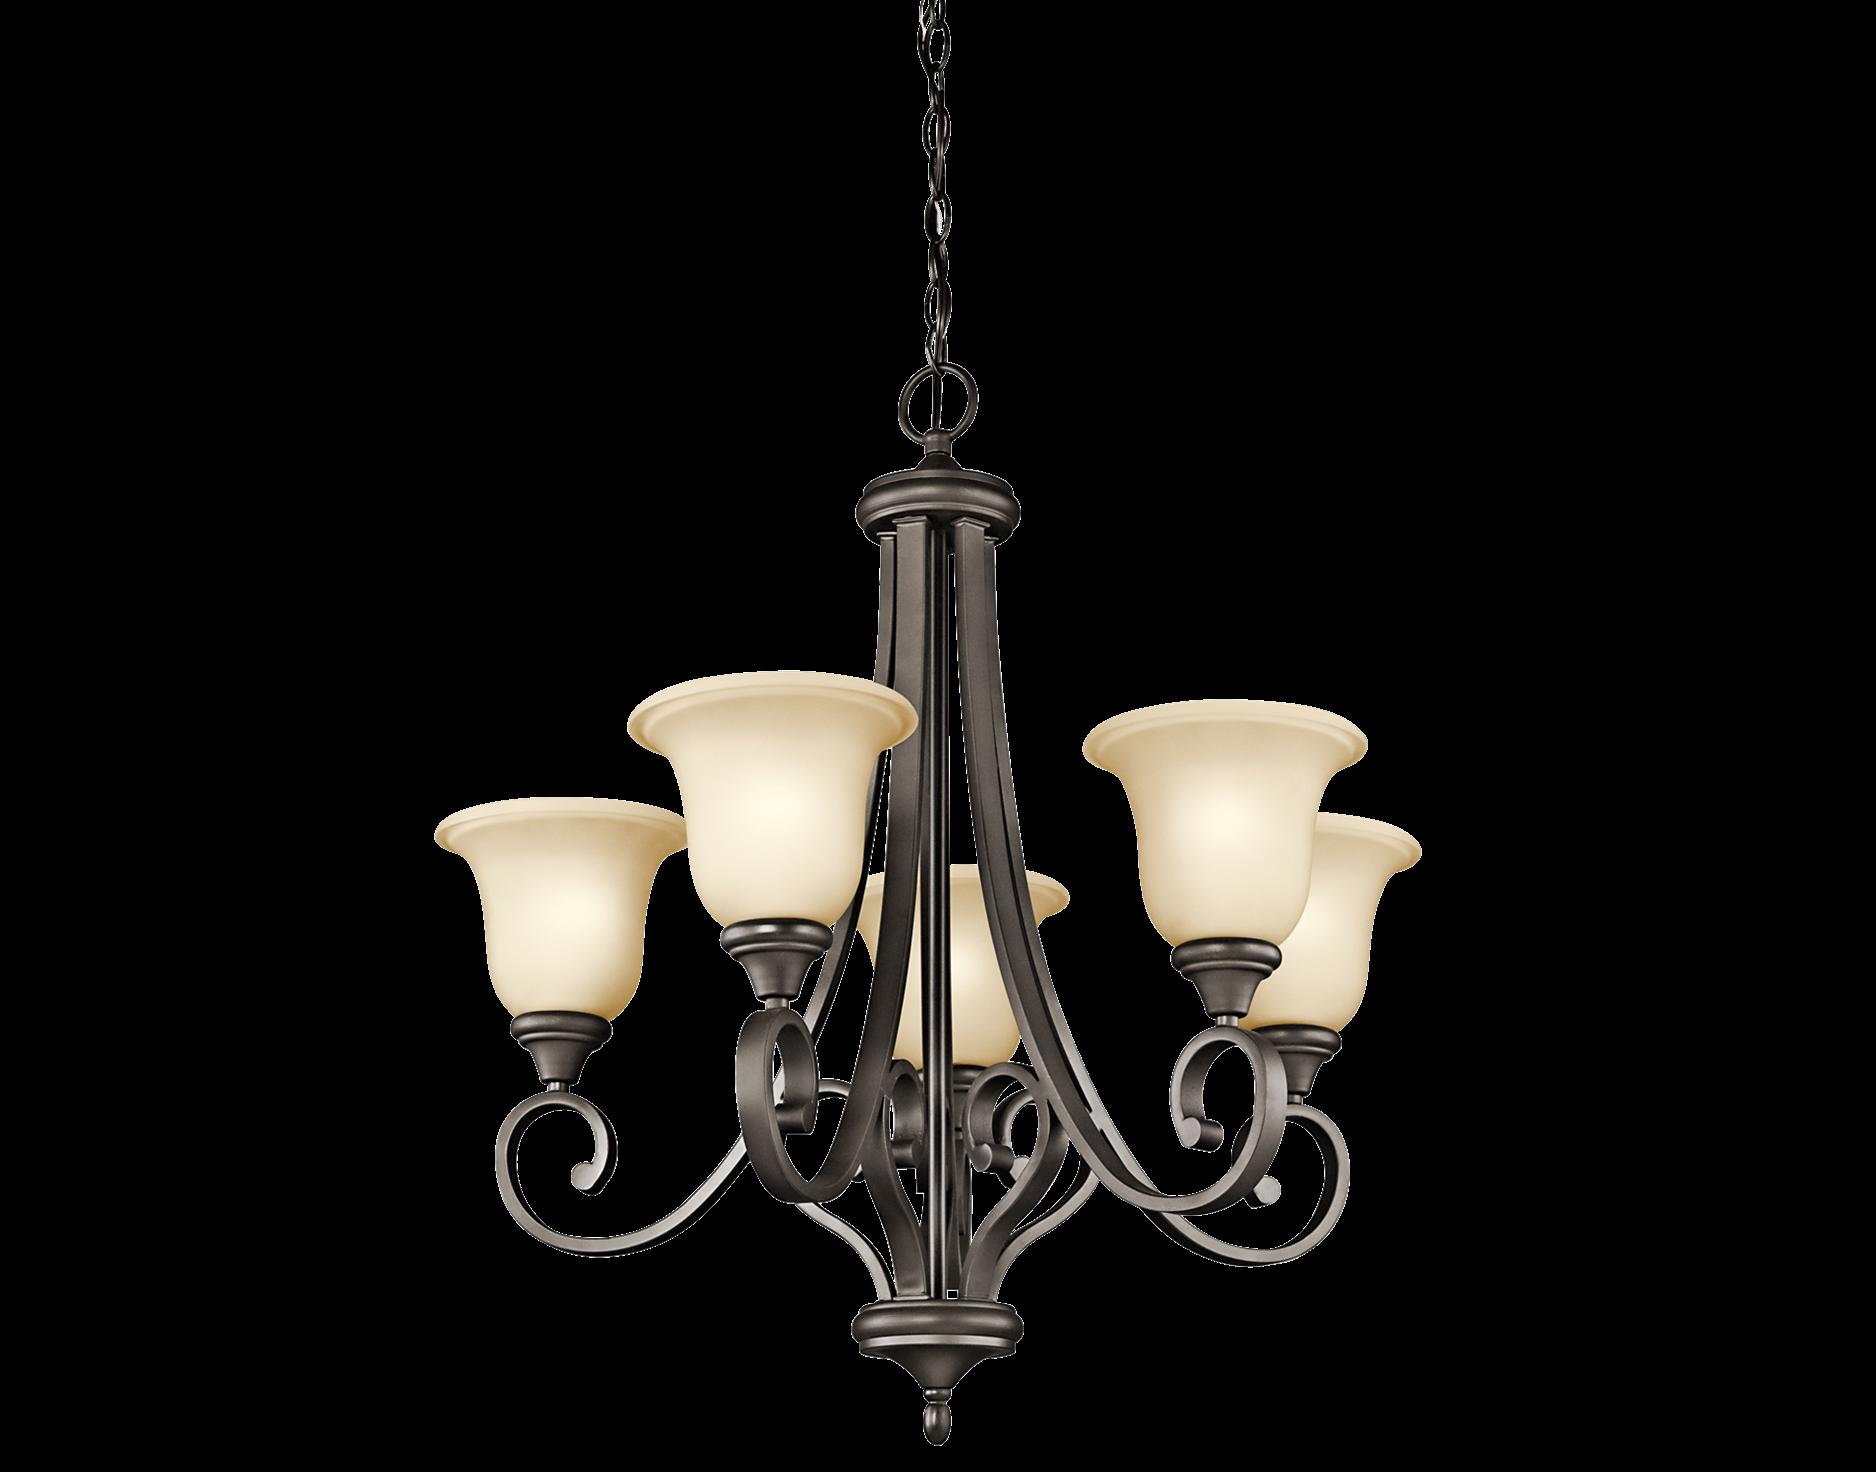 Monroe 5 light chandelier olde bronze tabor tuscan kitchen reno monroe 5 light chandelier olde bronze mozeypictures Choice Image